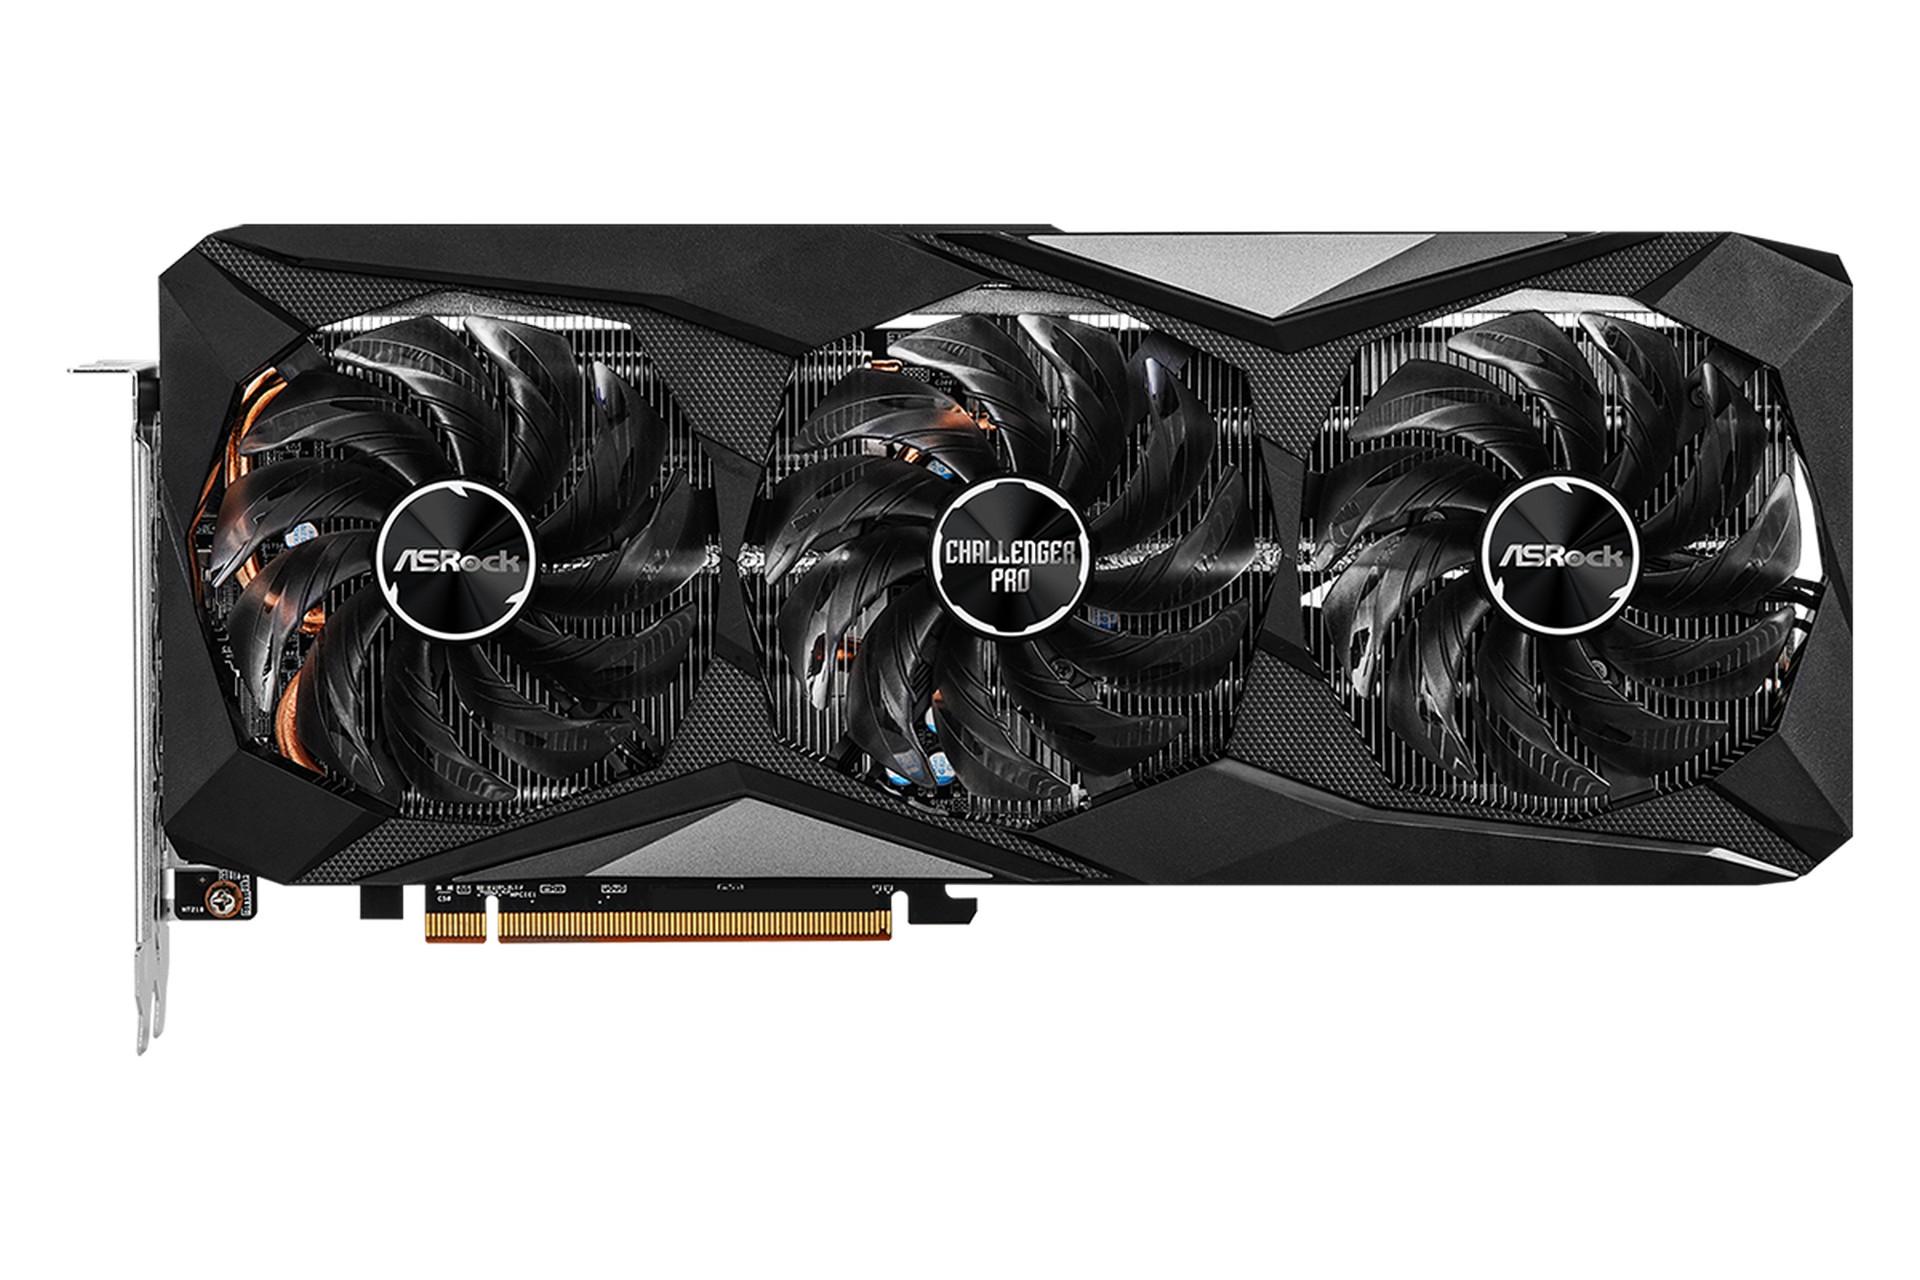 Card đồ họa AsRock AMD Radeon RX 6600 XT Challenger Pro